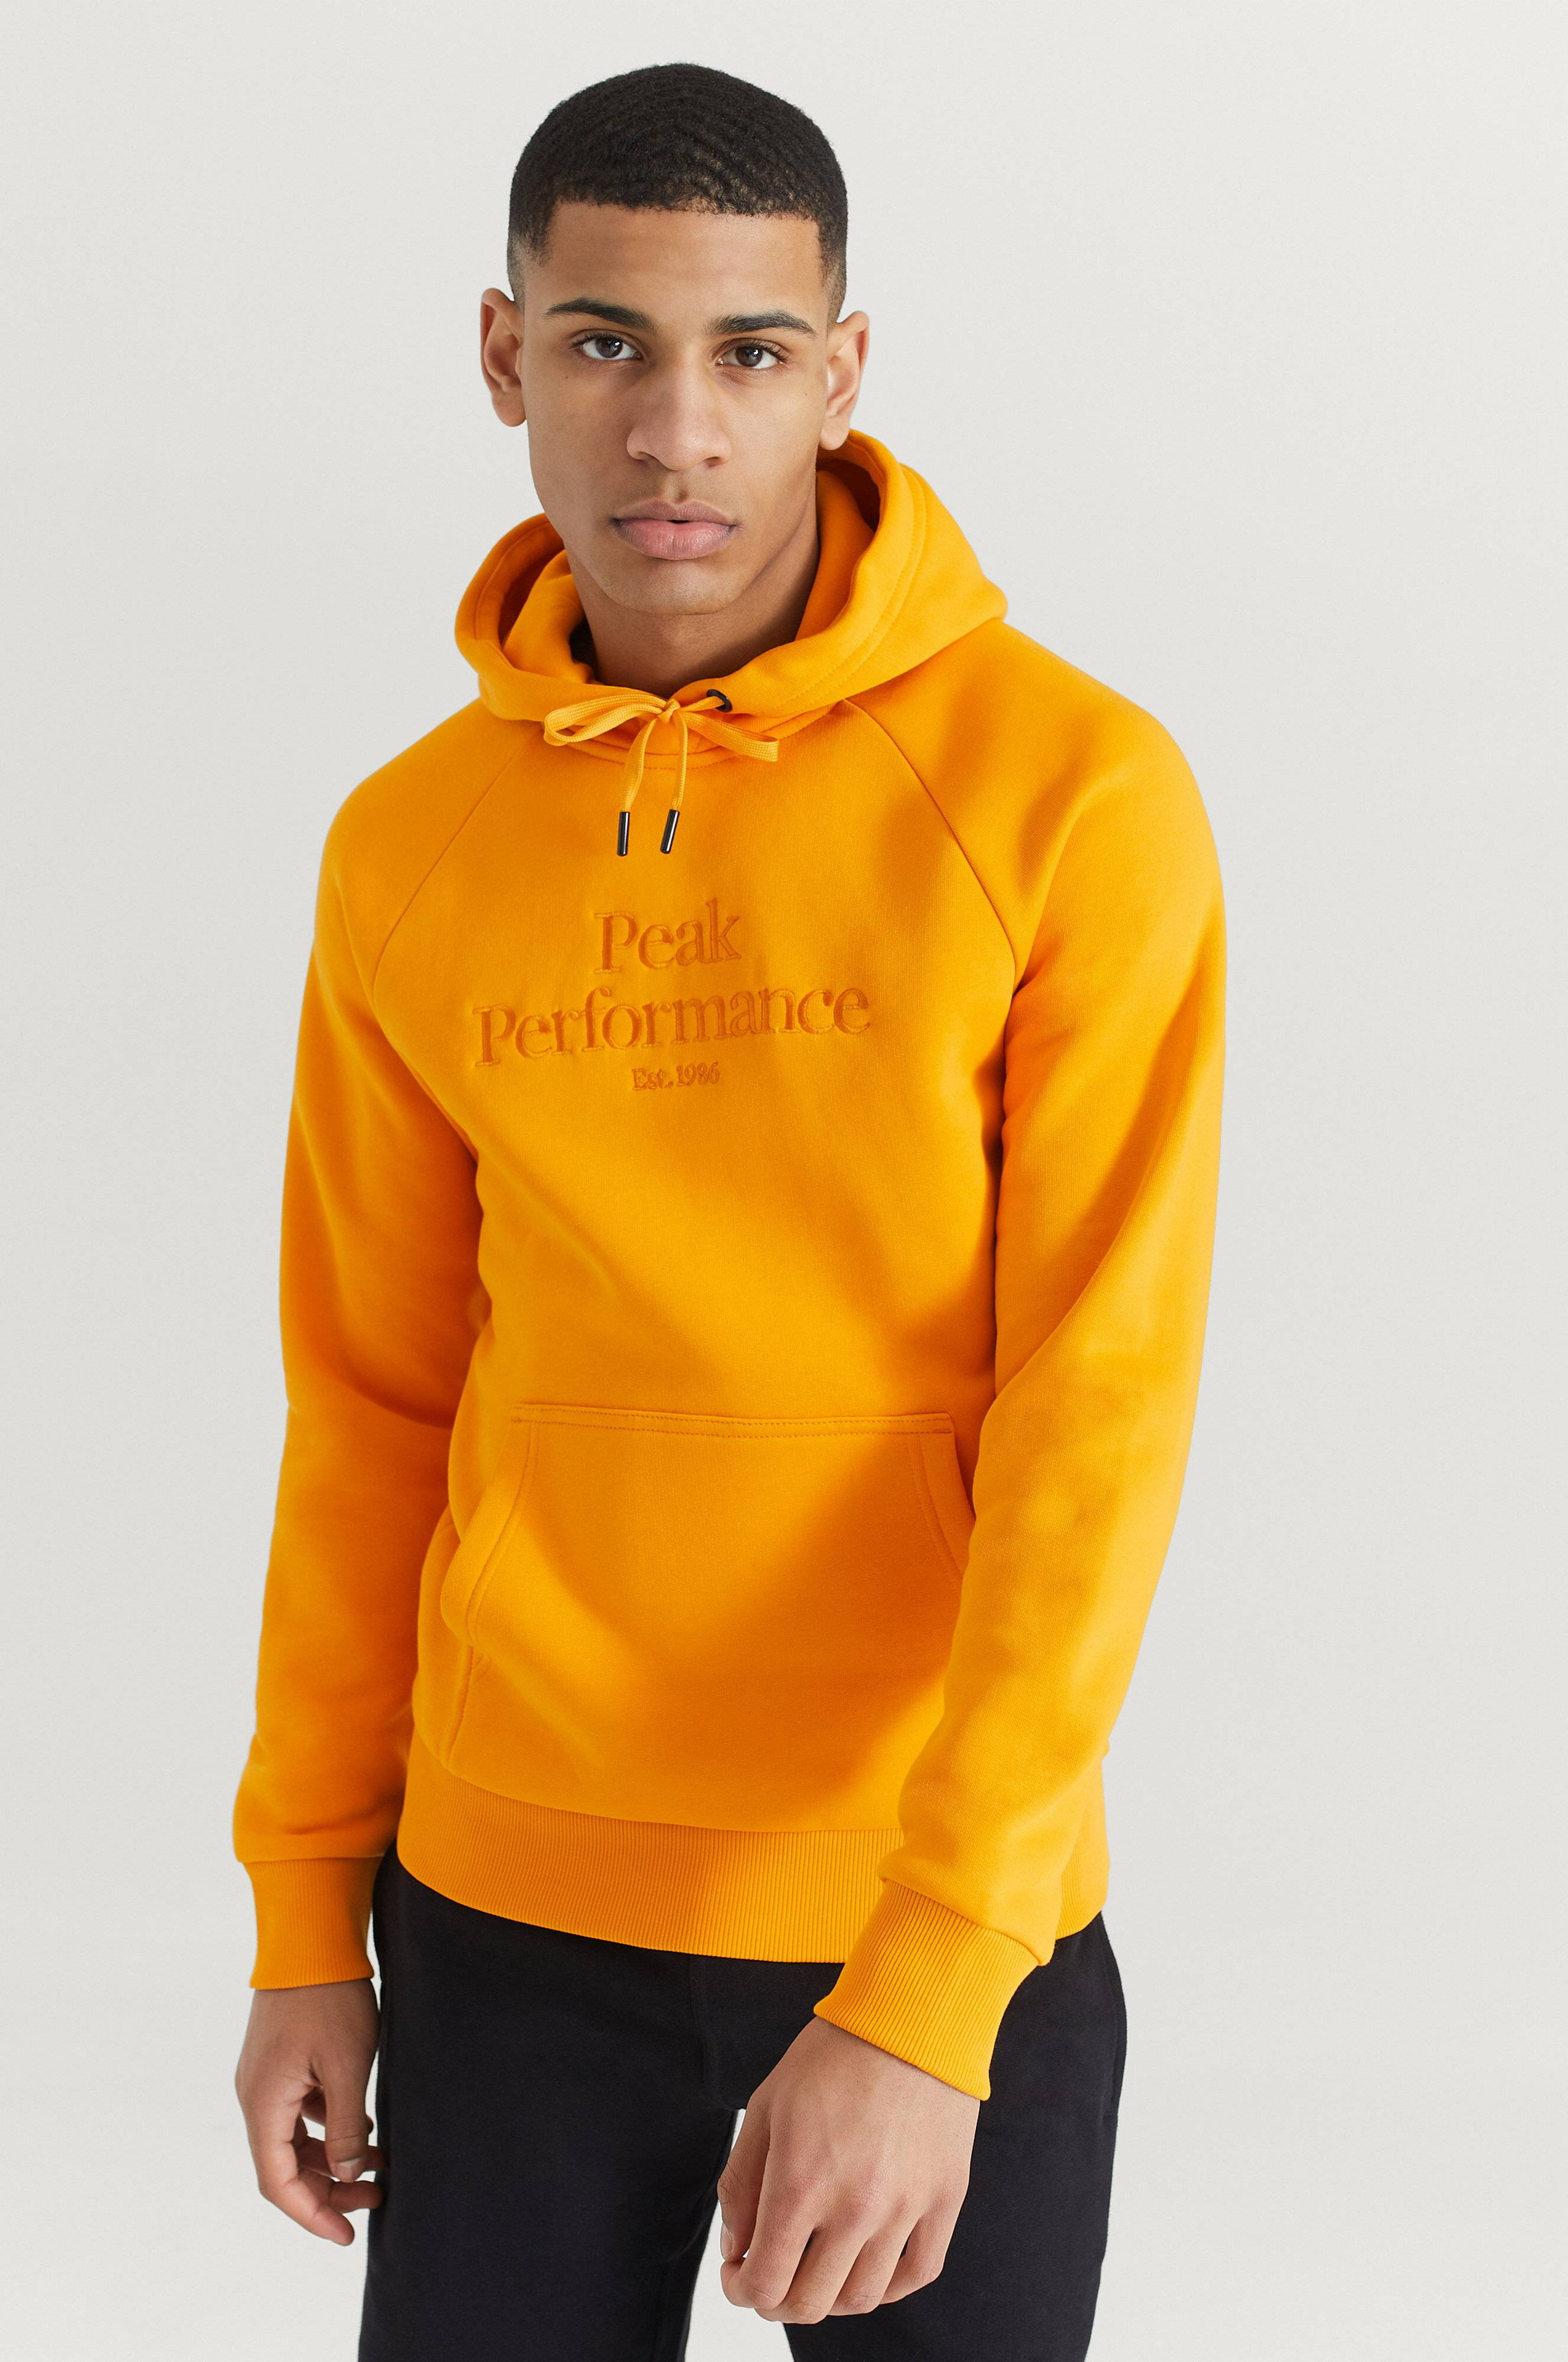 Peak Performance Hoodie Original Hood Orange